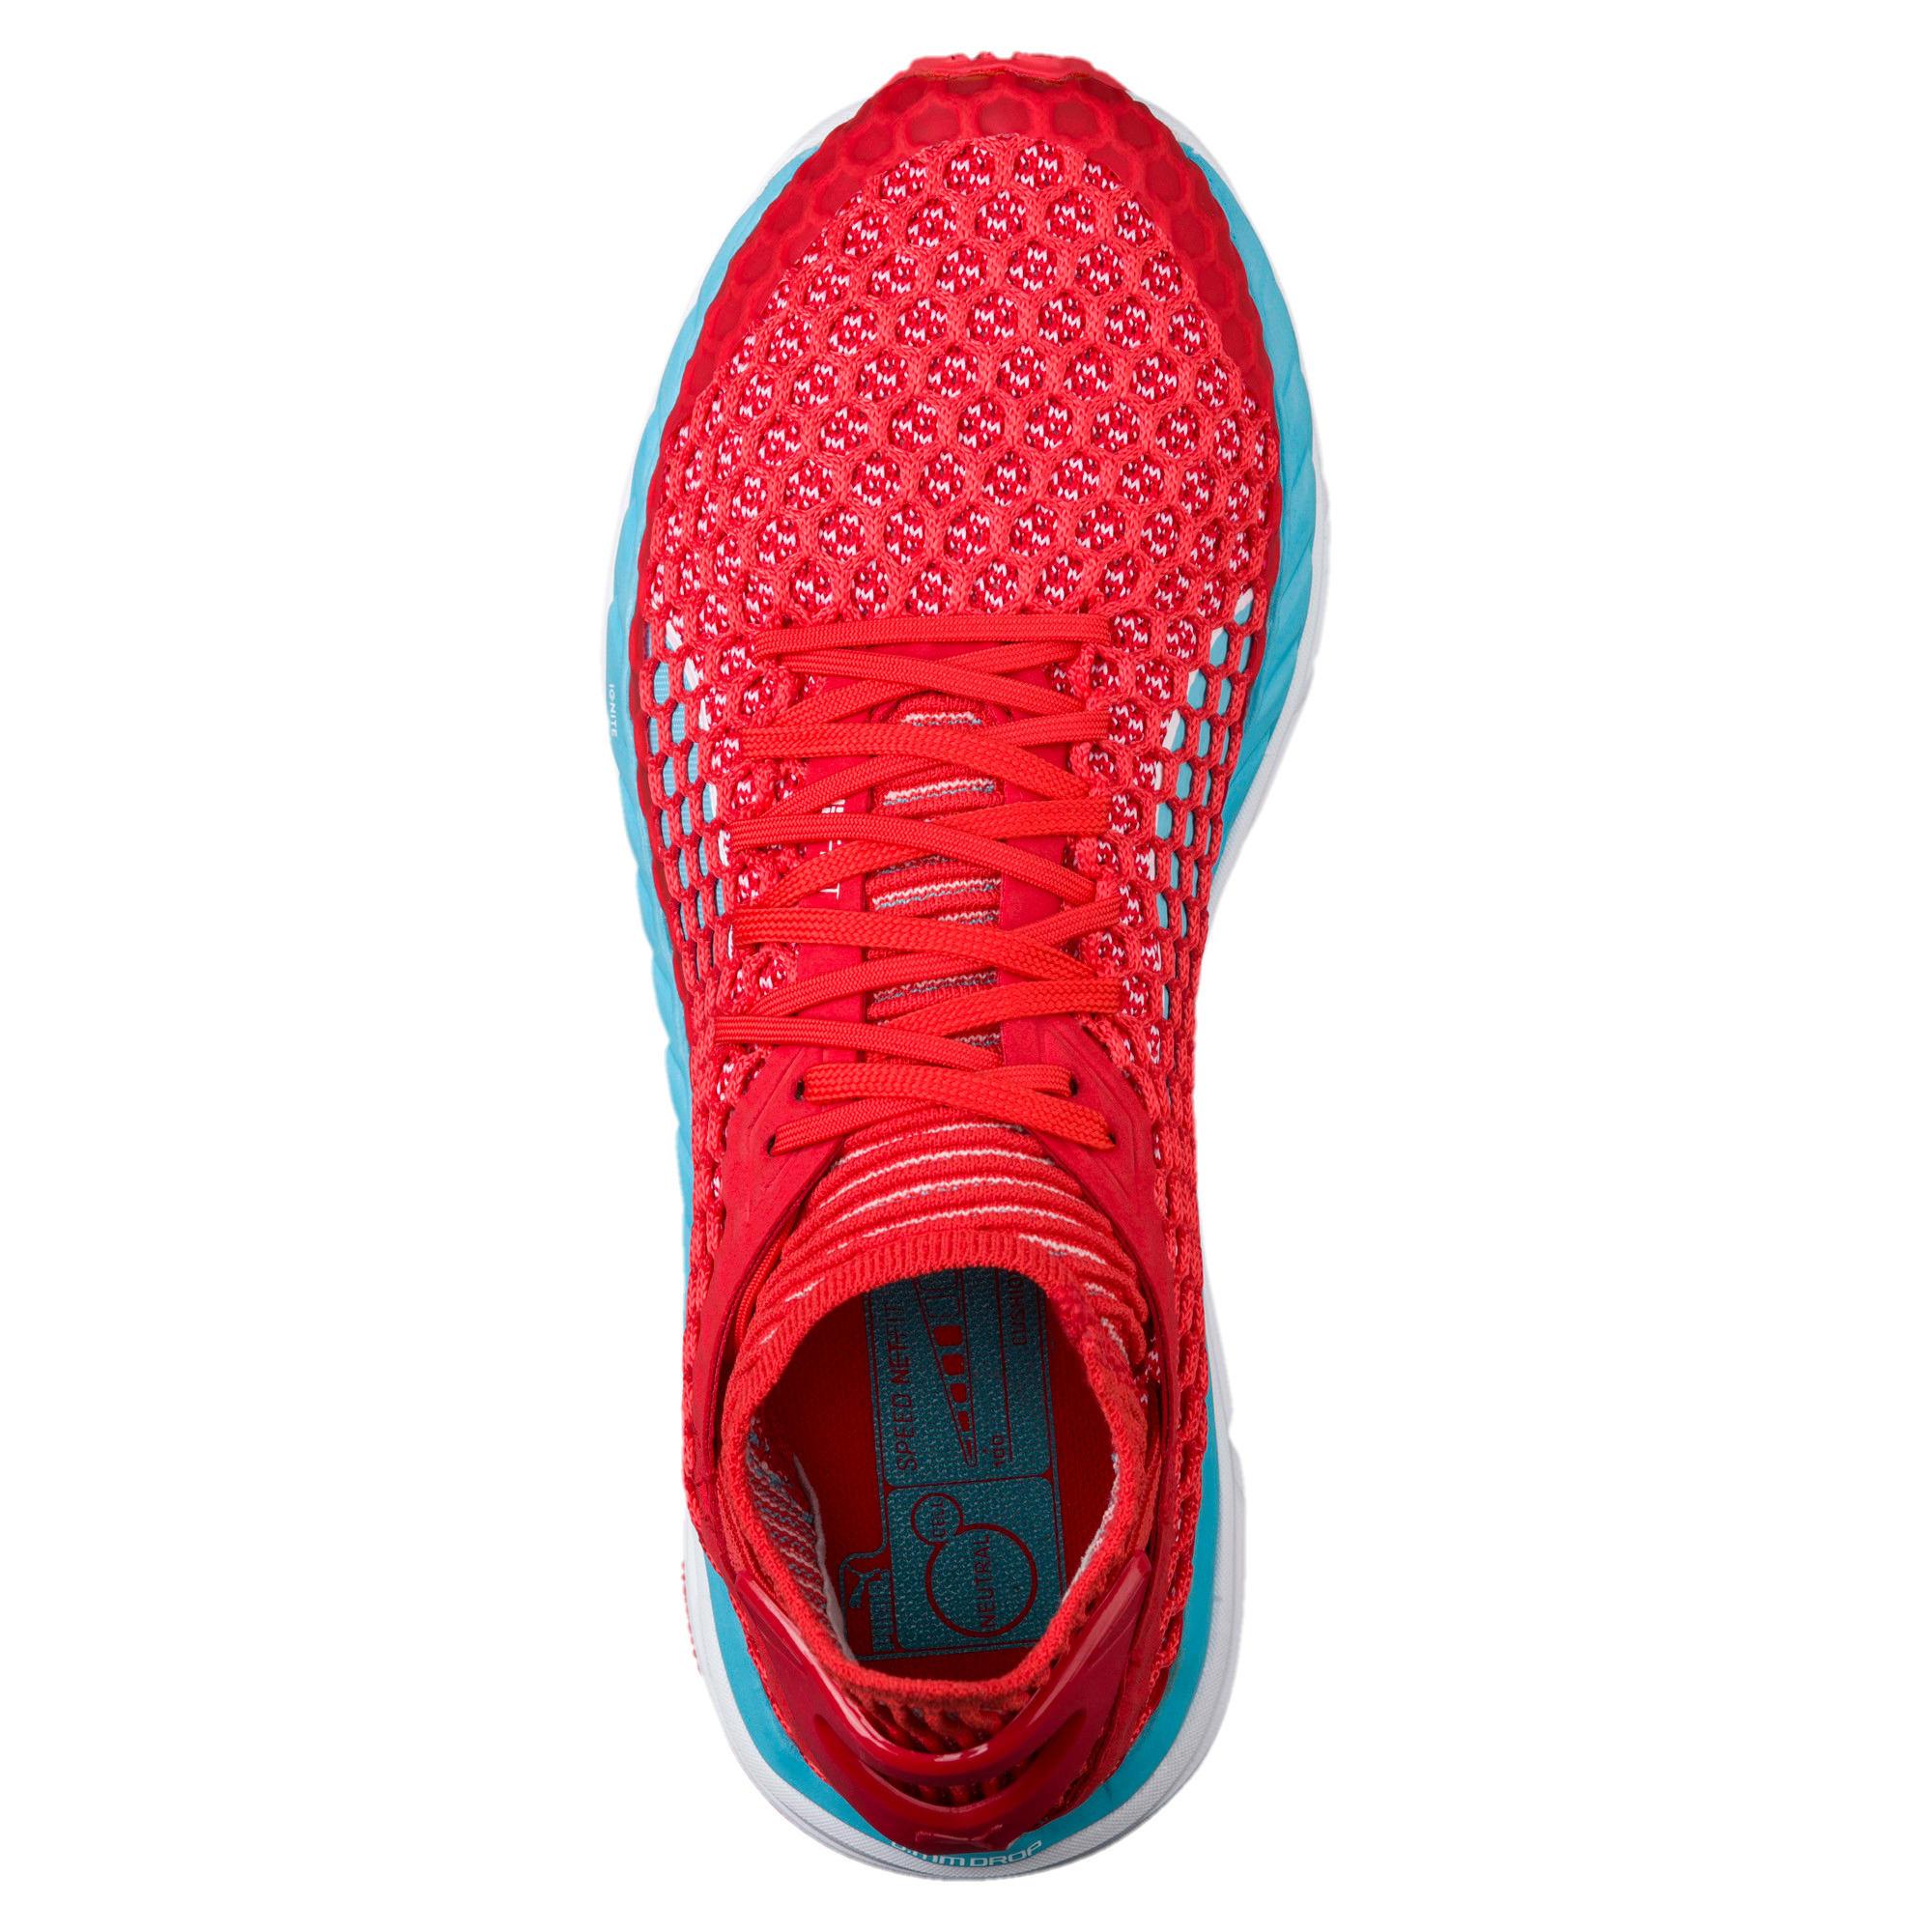 Thumbnail 5 of SPEED IGNITE NETFIT Women's Running Shoes, Poppy Red-Turquoise-White, medium